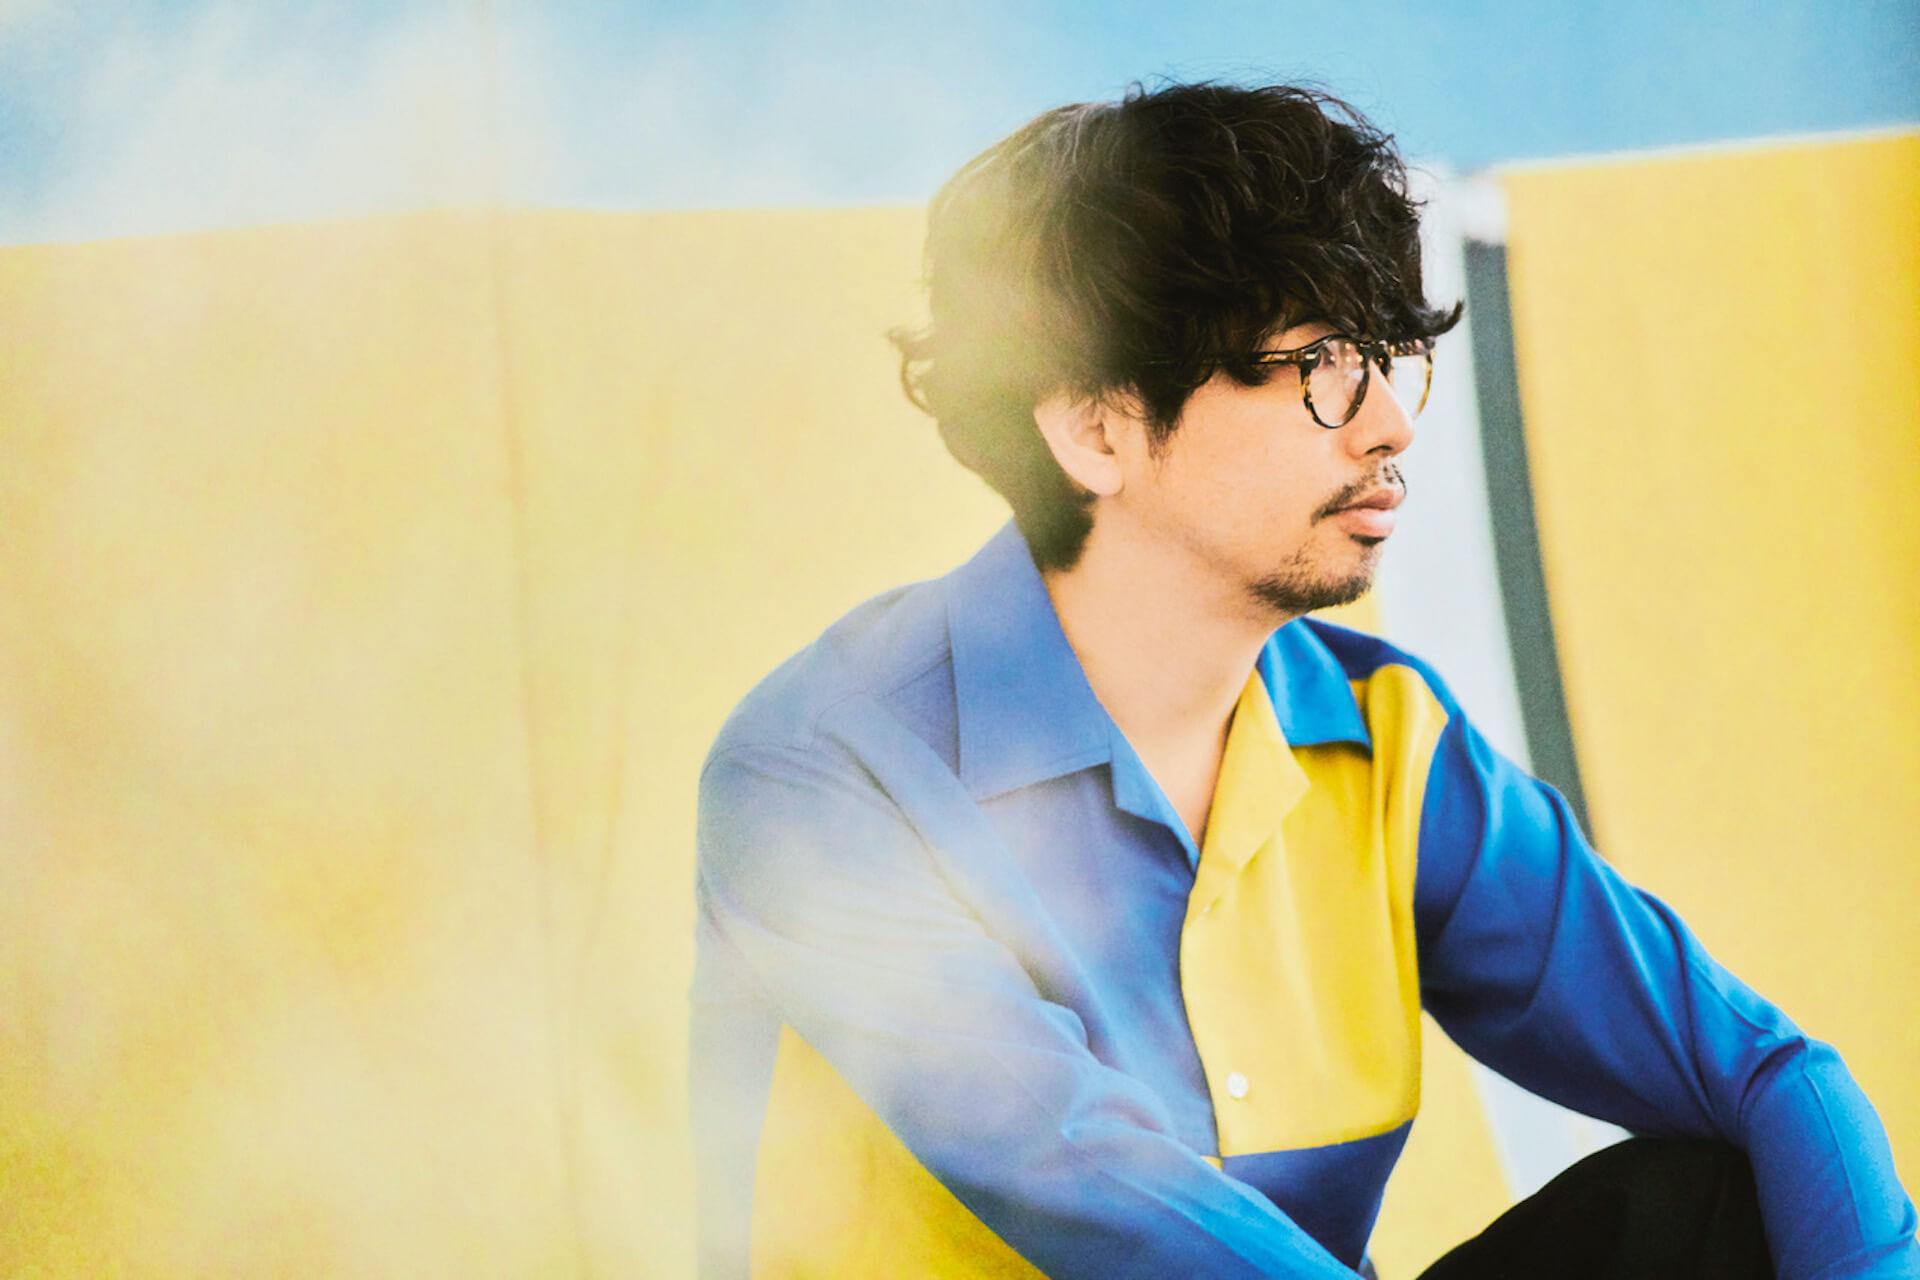 "Jazzの未来を鳴らすドラマーHironori MomoiがGotchを迎えた新曲""Fog feat.Gotch""をリリース!2ndアルバム詳細も発表 music210608_hironarimomoi1"